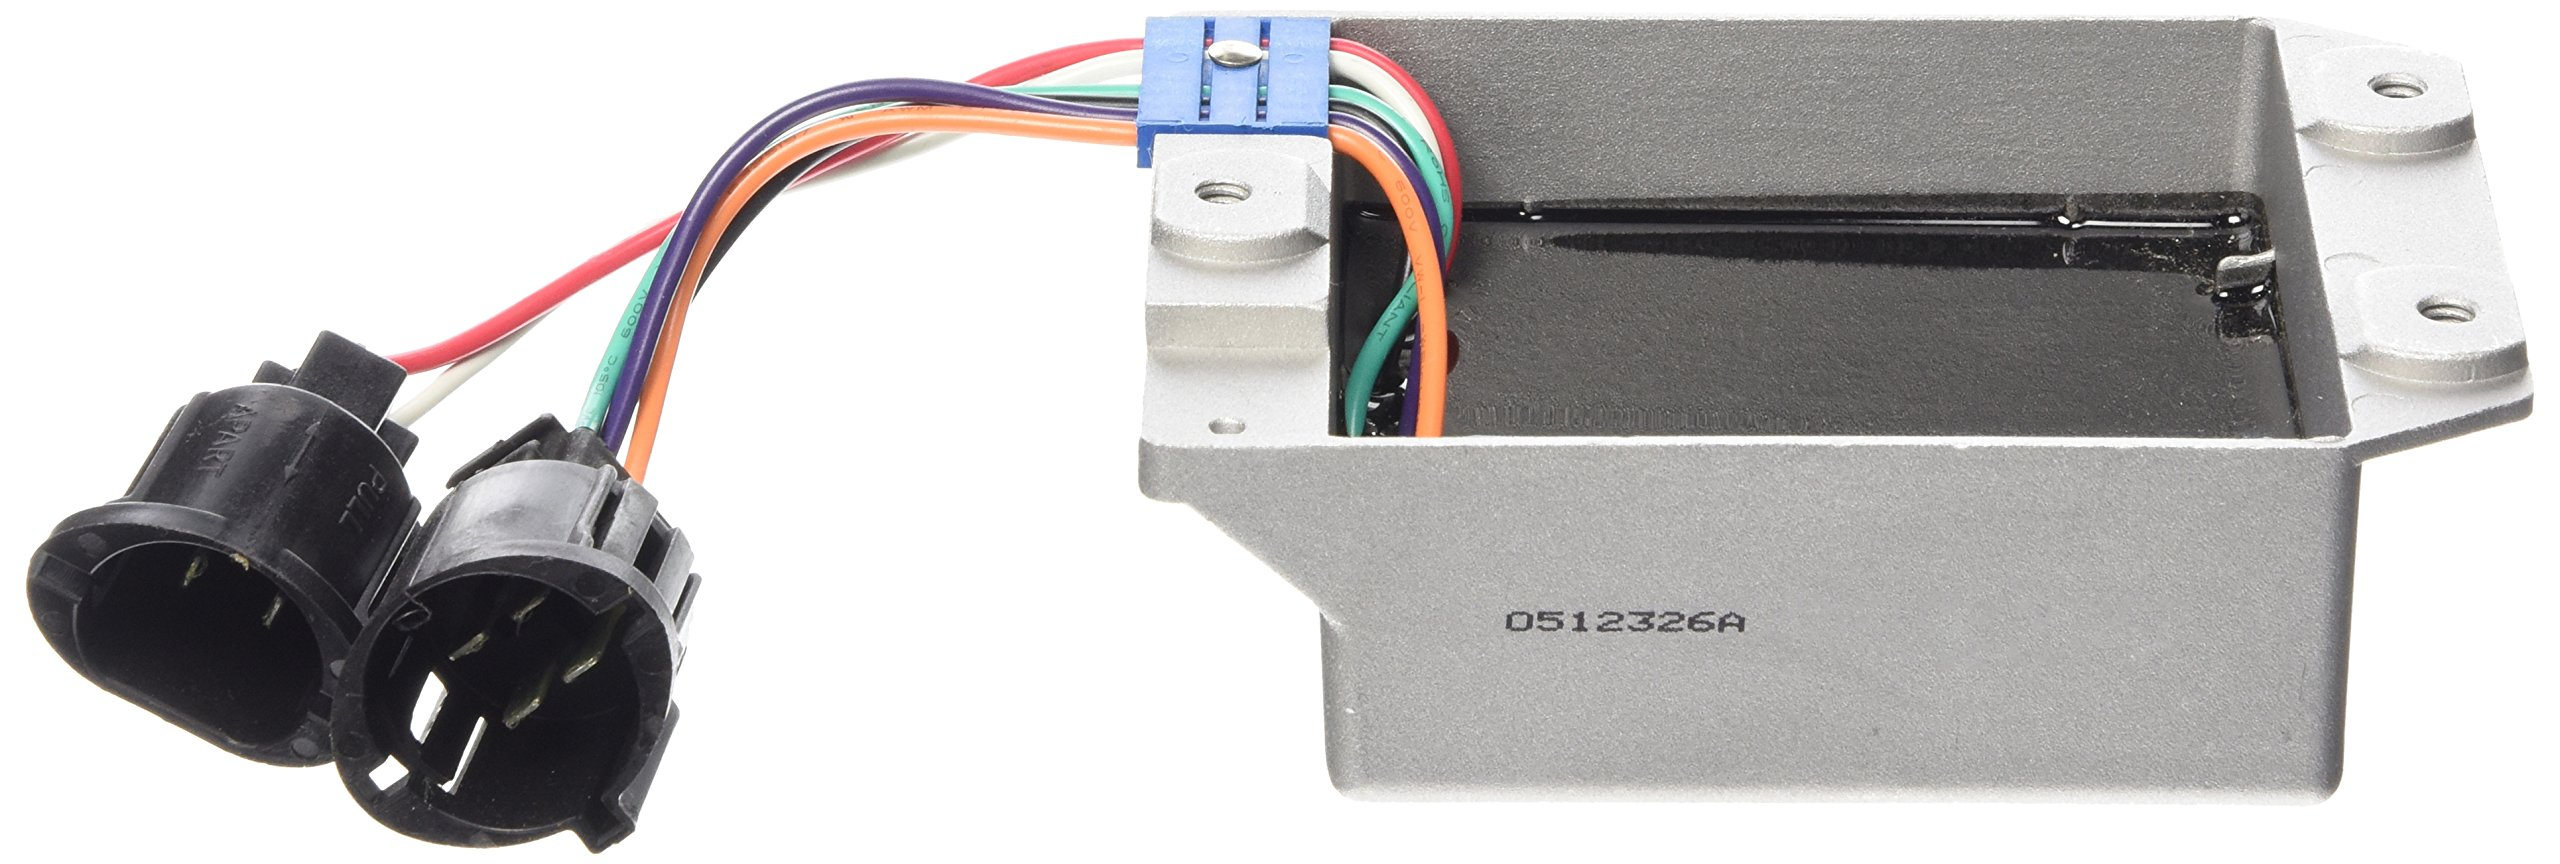 Lx203t Ignition Control Module Wiring Diagram Automotive Gm Amazon Com Standard Motor Products Rh Robertshaw Hei Distributor